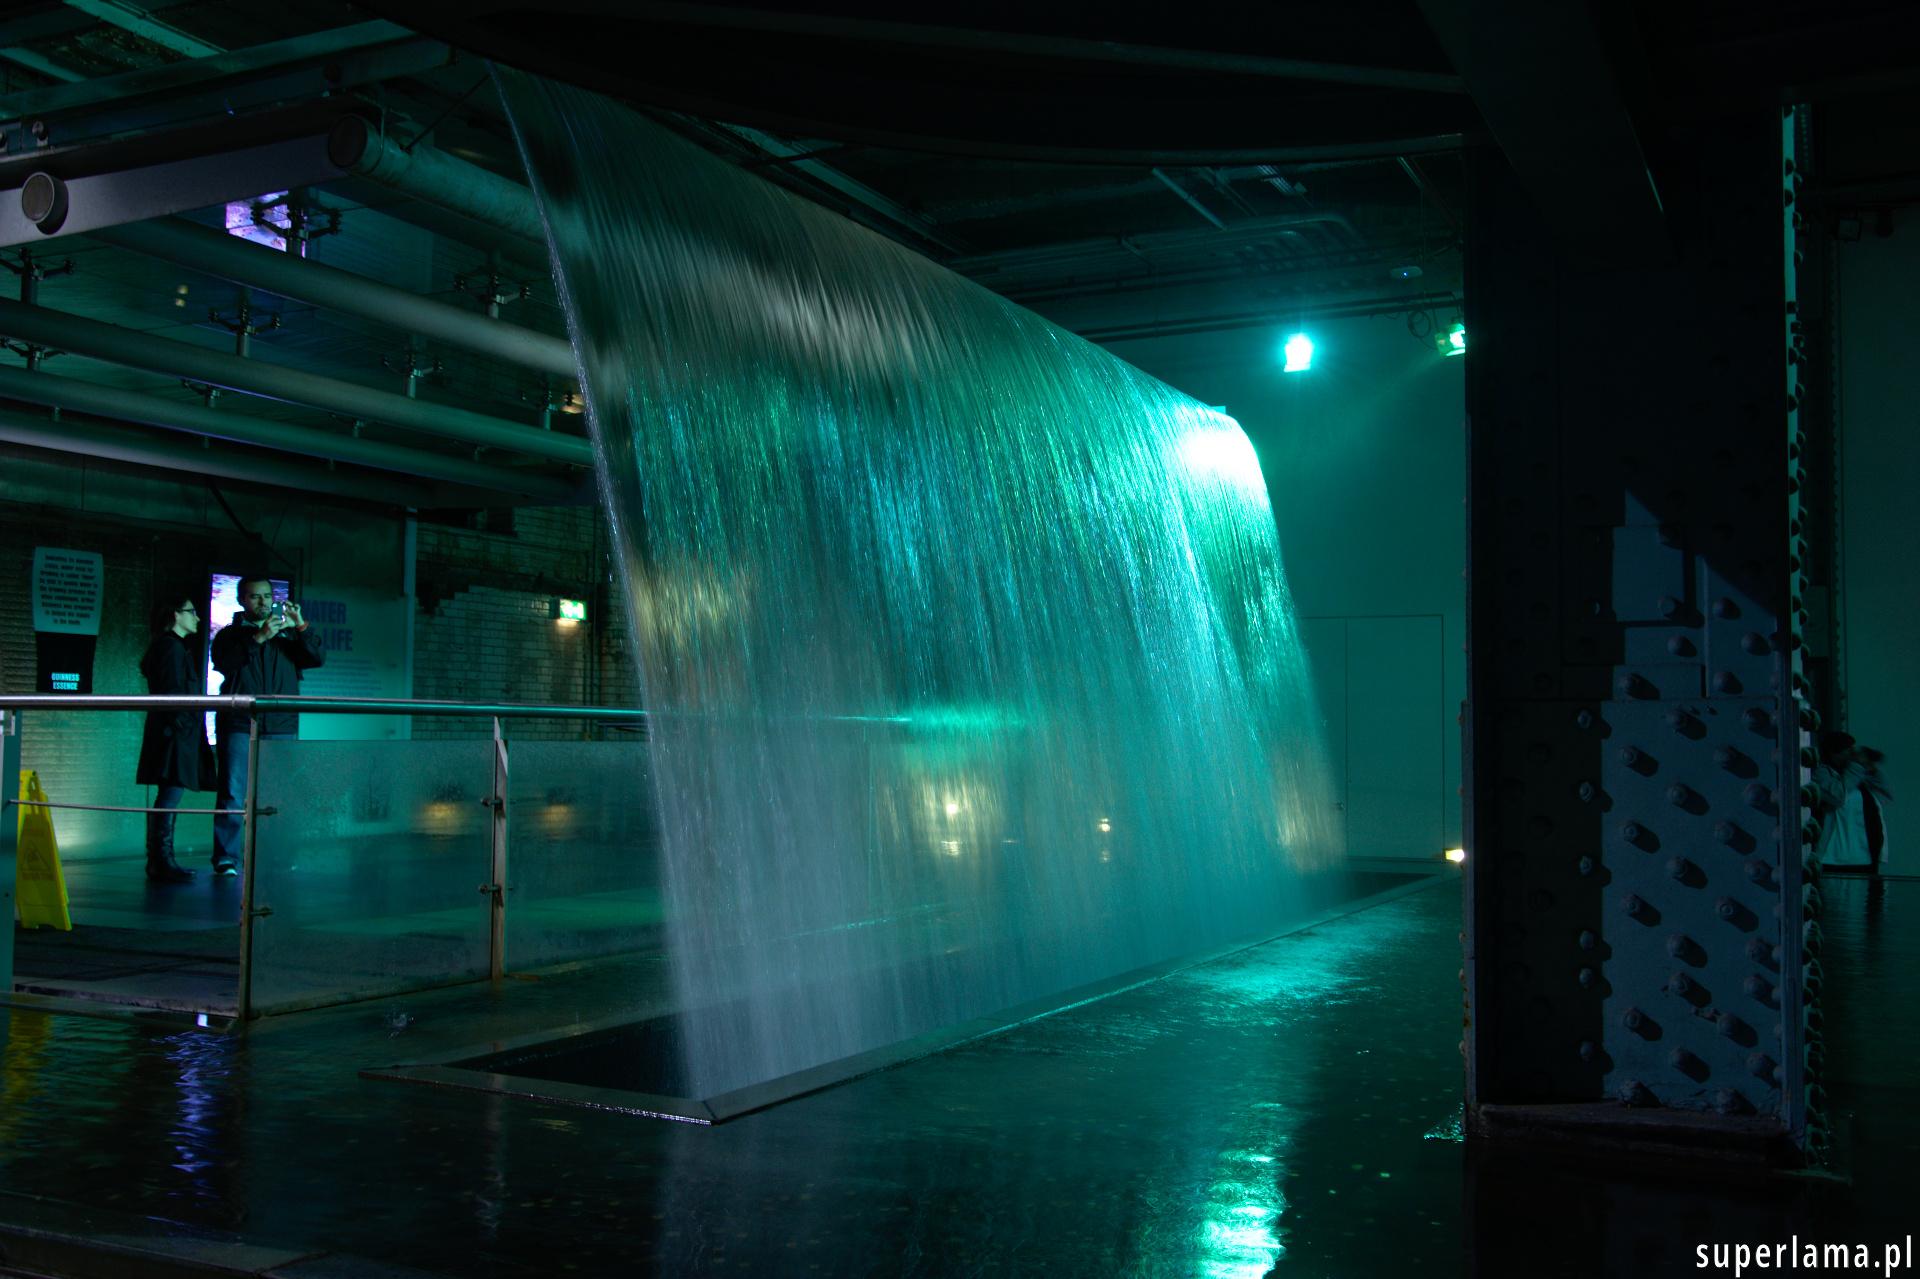 guinness - water - woda